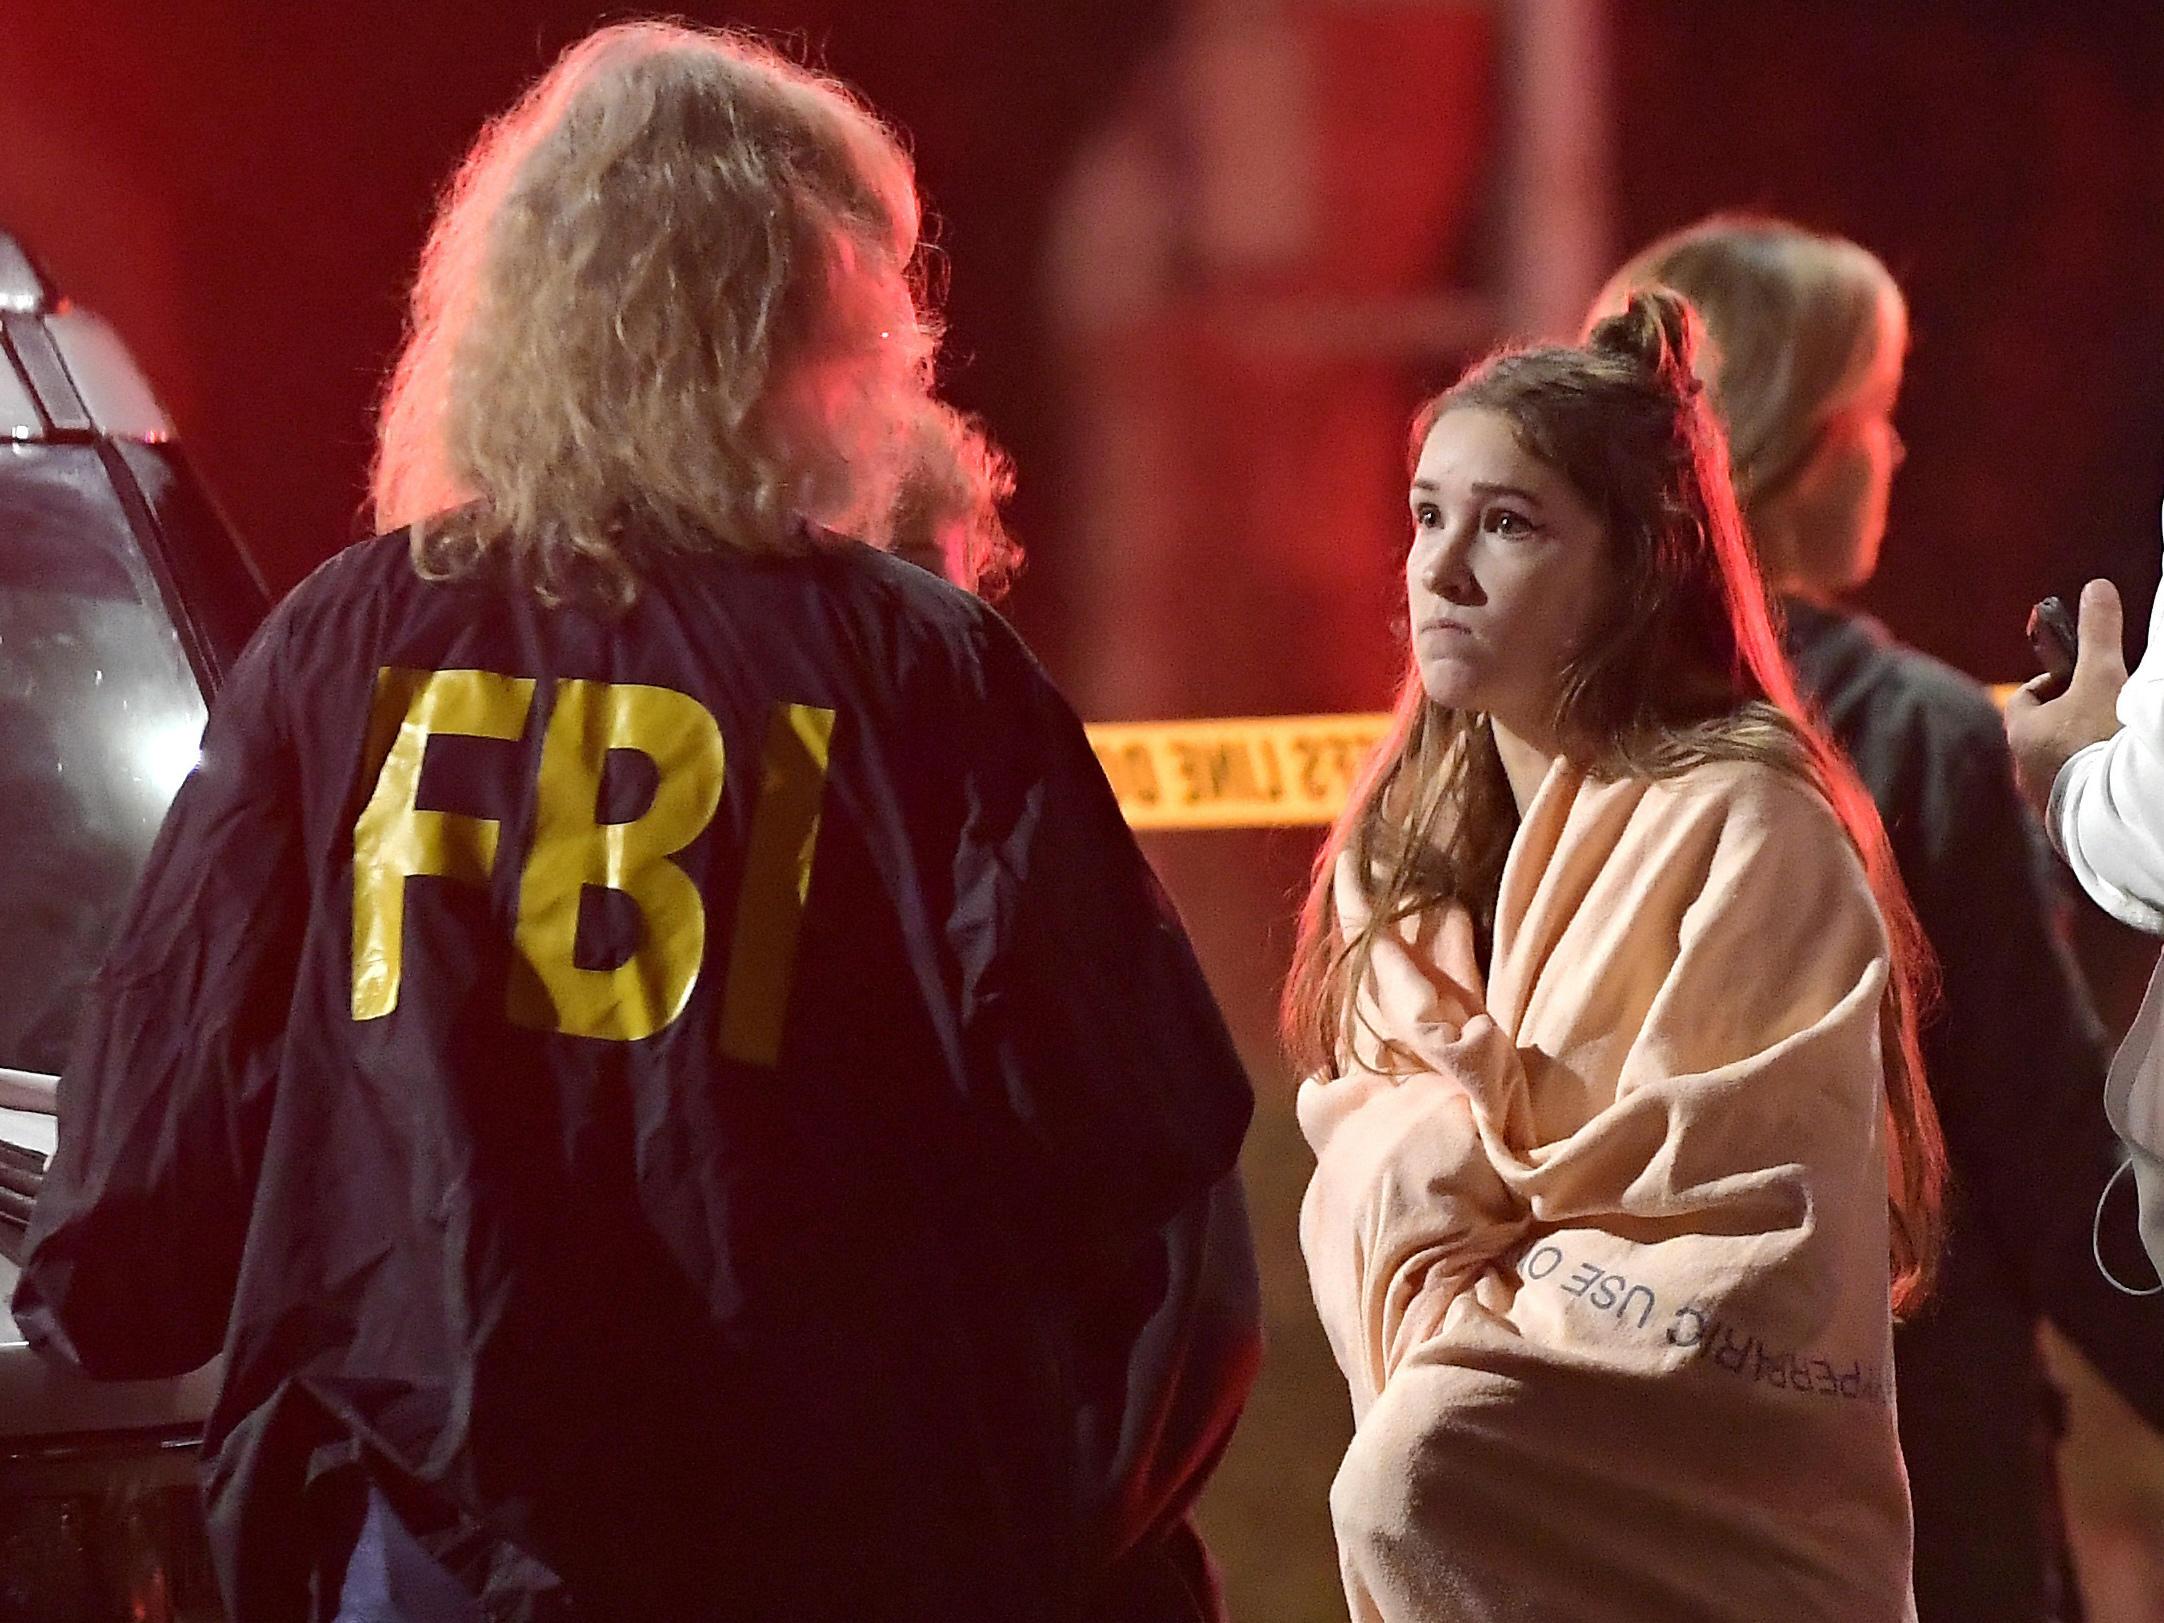 Gunman Kills 12 People At Country Music Bar In Thousand Oaks Calif